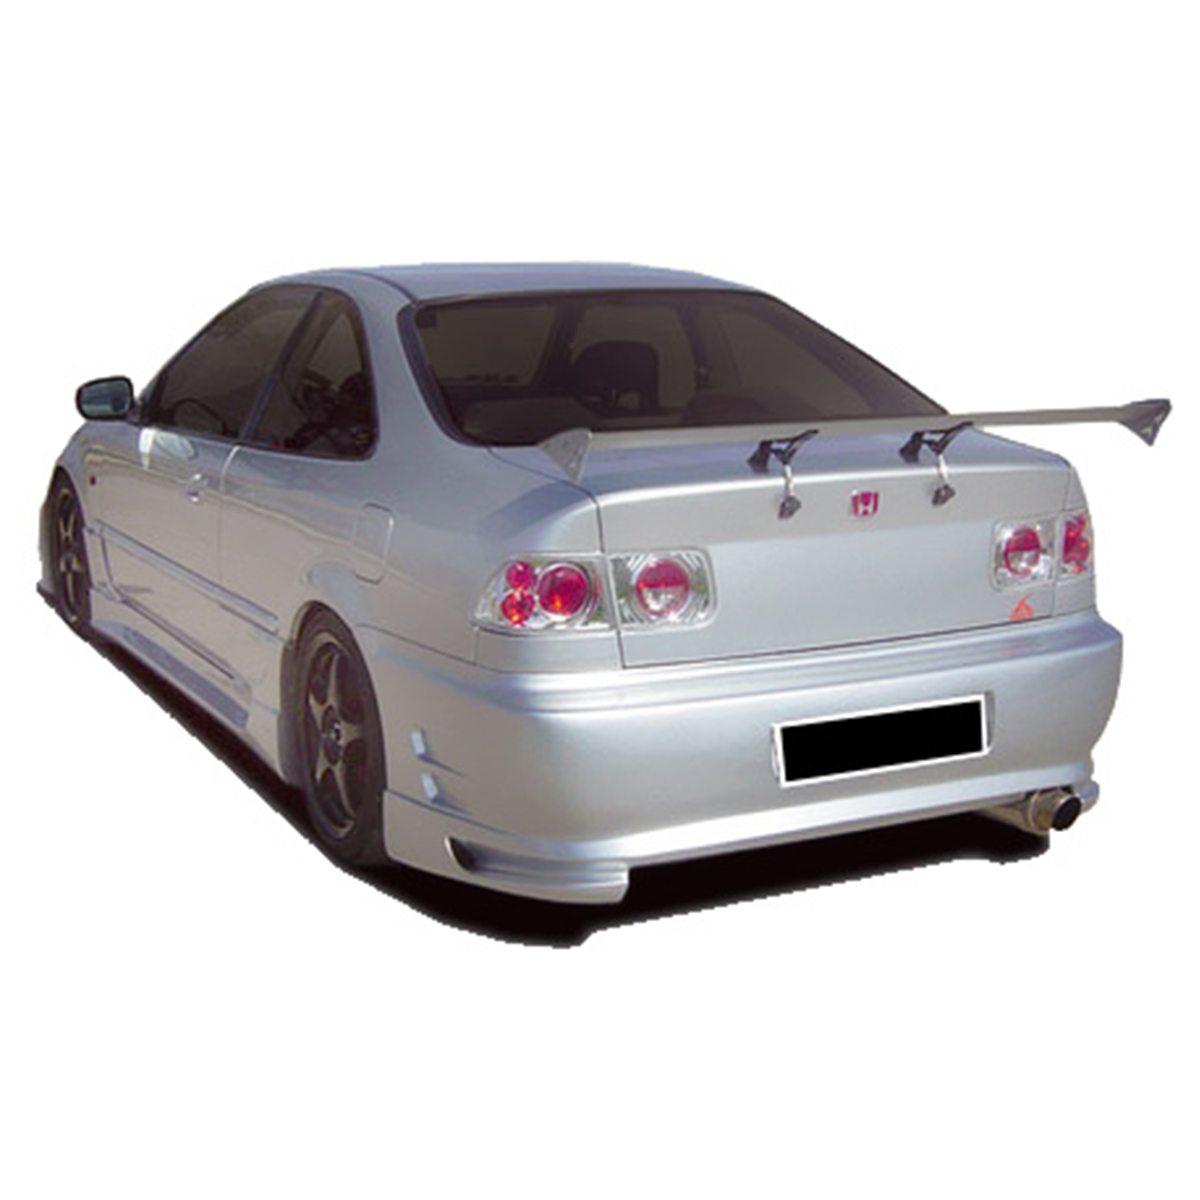 Honda-Civic-98-Coupe-Twister-Tras-PCA043